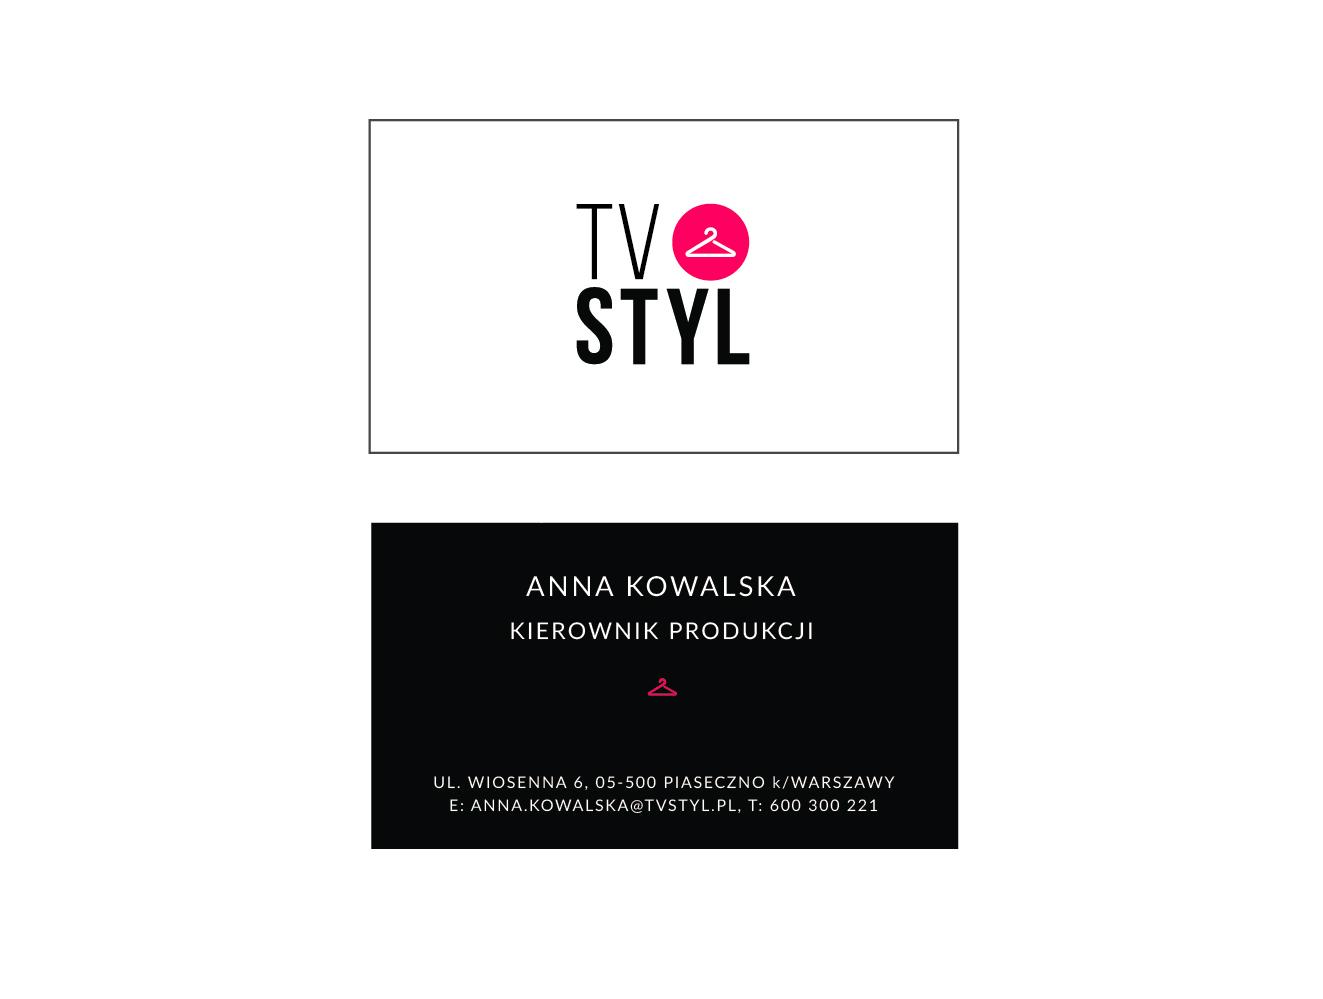 TV STYL 4